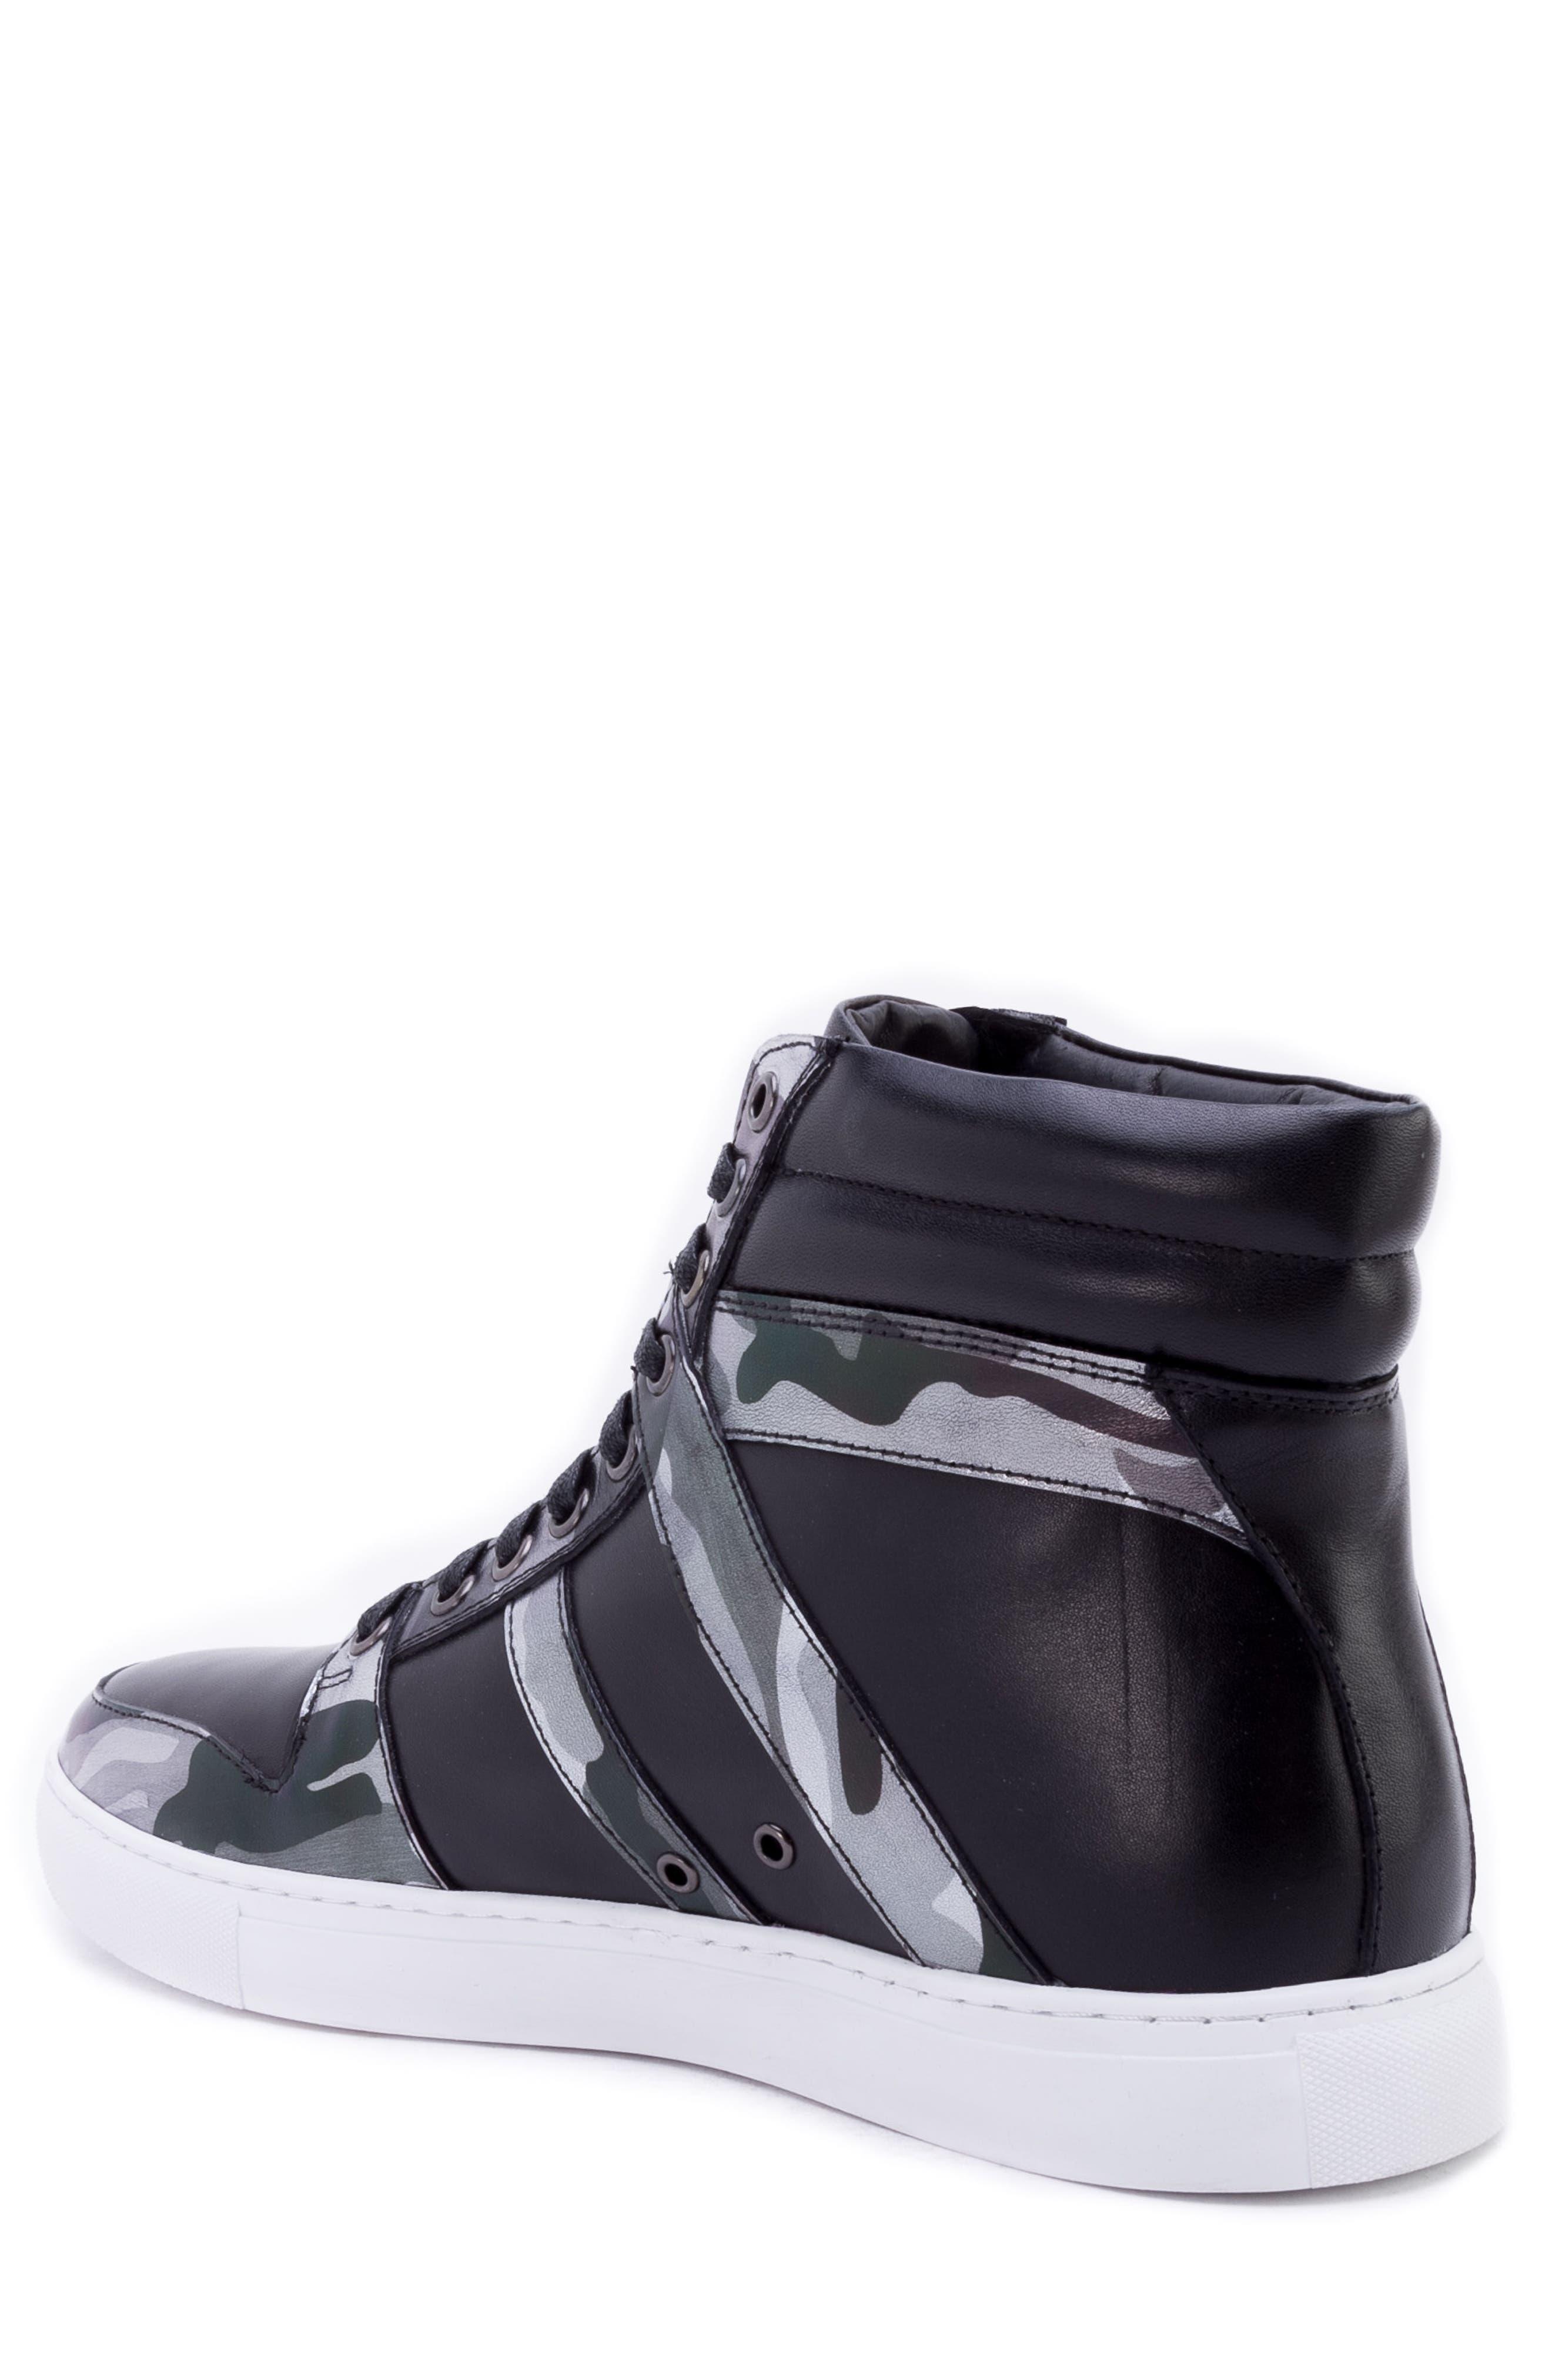 Sutherland Sneaker,                             Alternate thumbnail 2, color,                             BLACK LEATHER